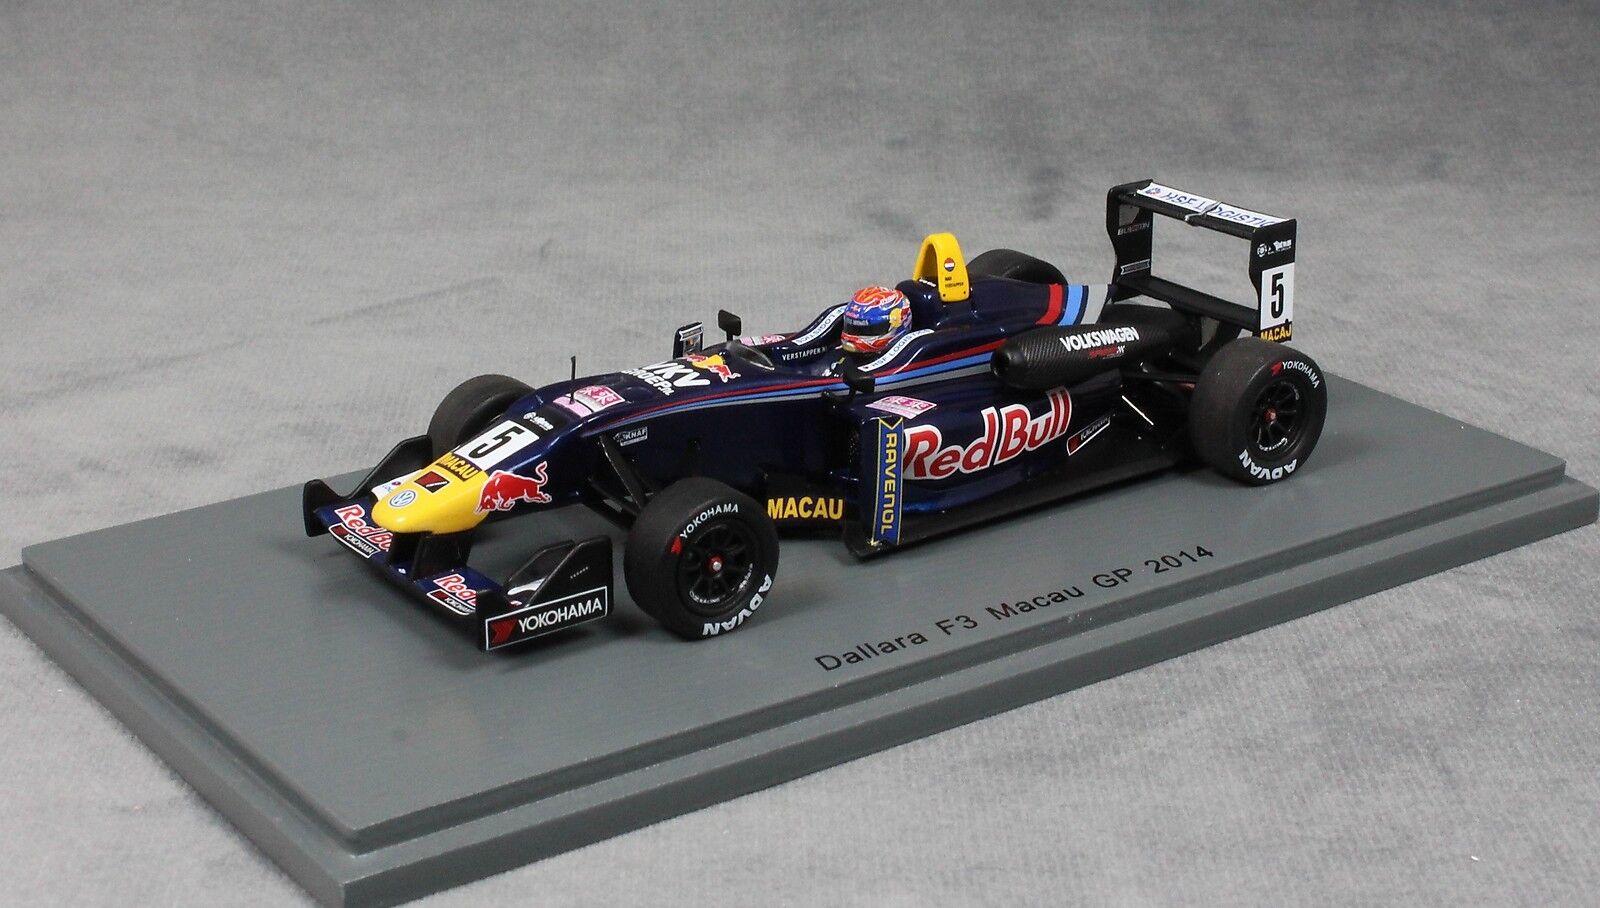 Spark Dallara Volkswagen Macau GP F3 Race 2014 Max Verstappen SA105 1 43 NEW